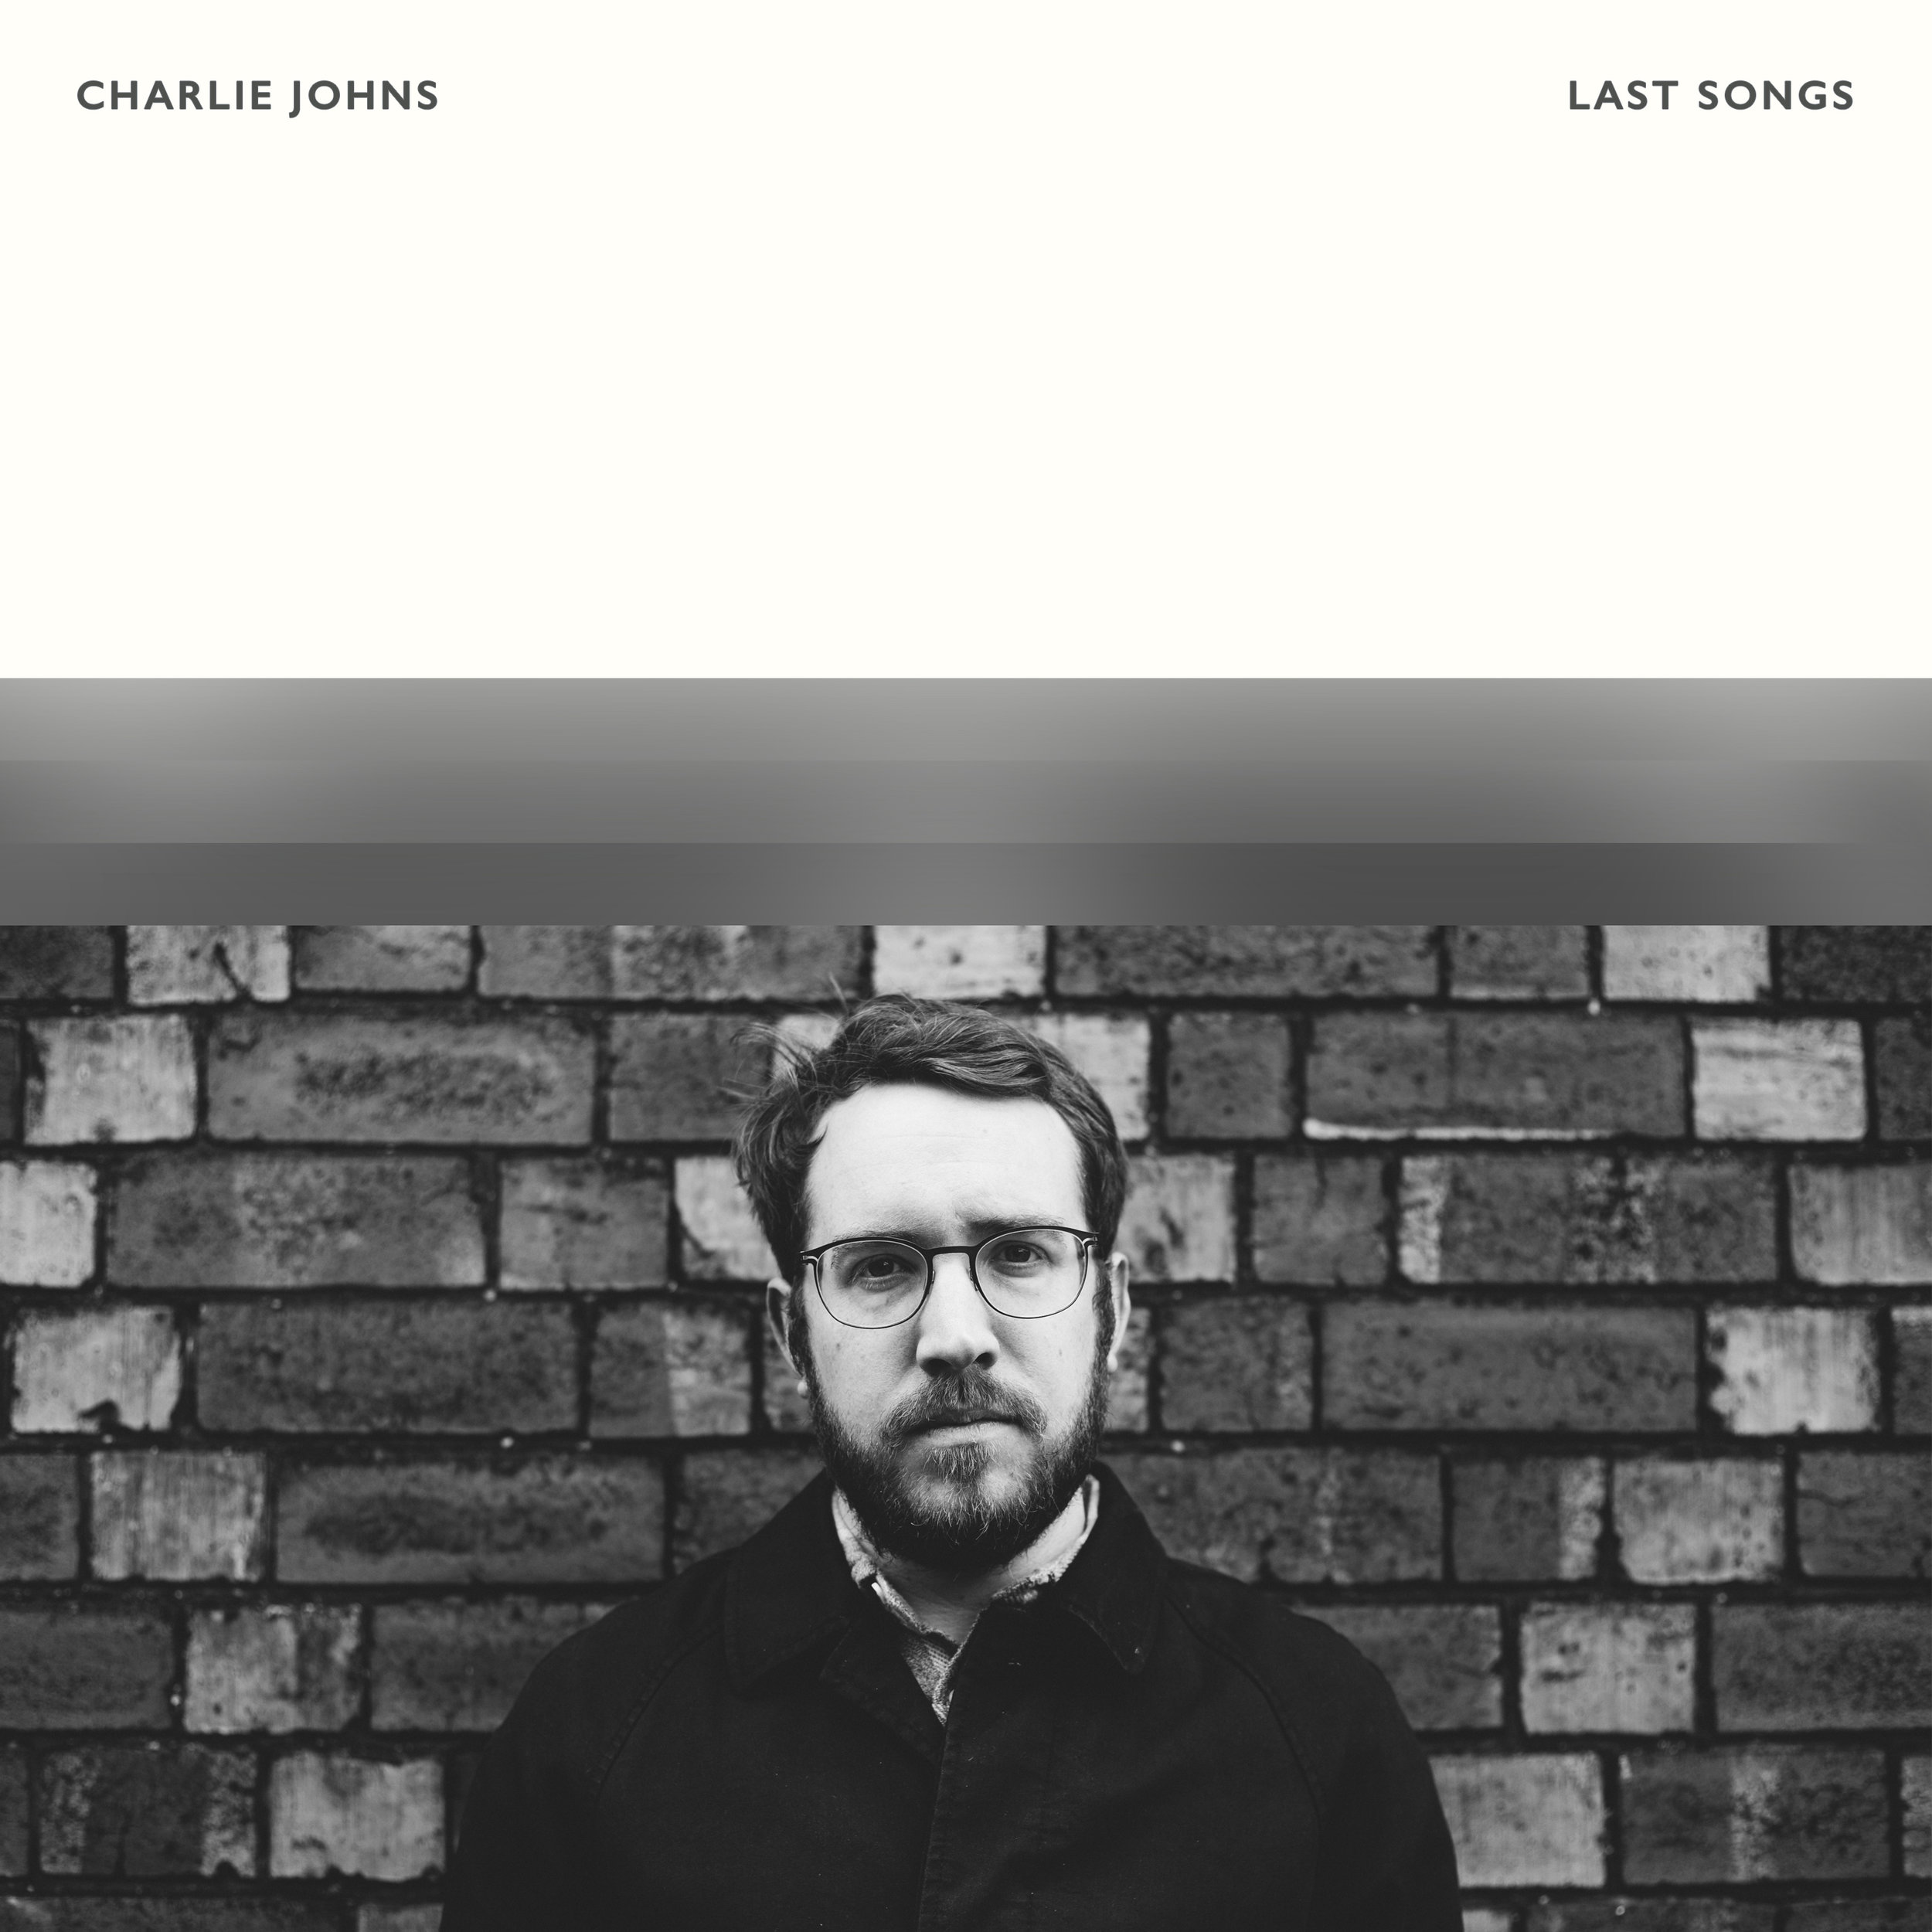 Charlie Johns - Last Songs